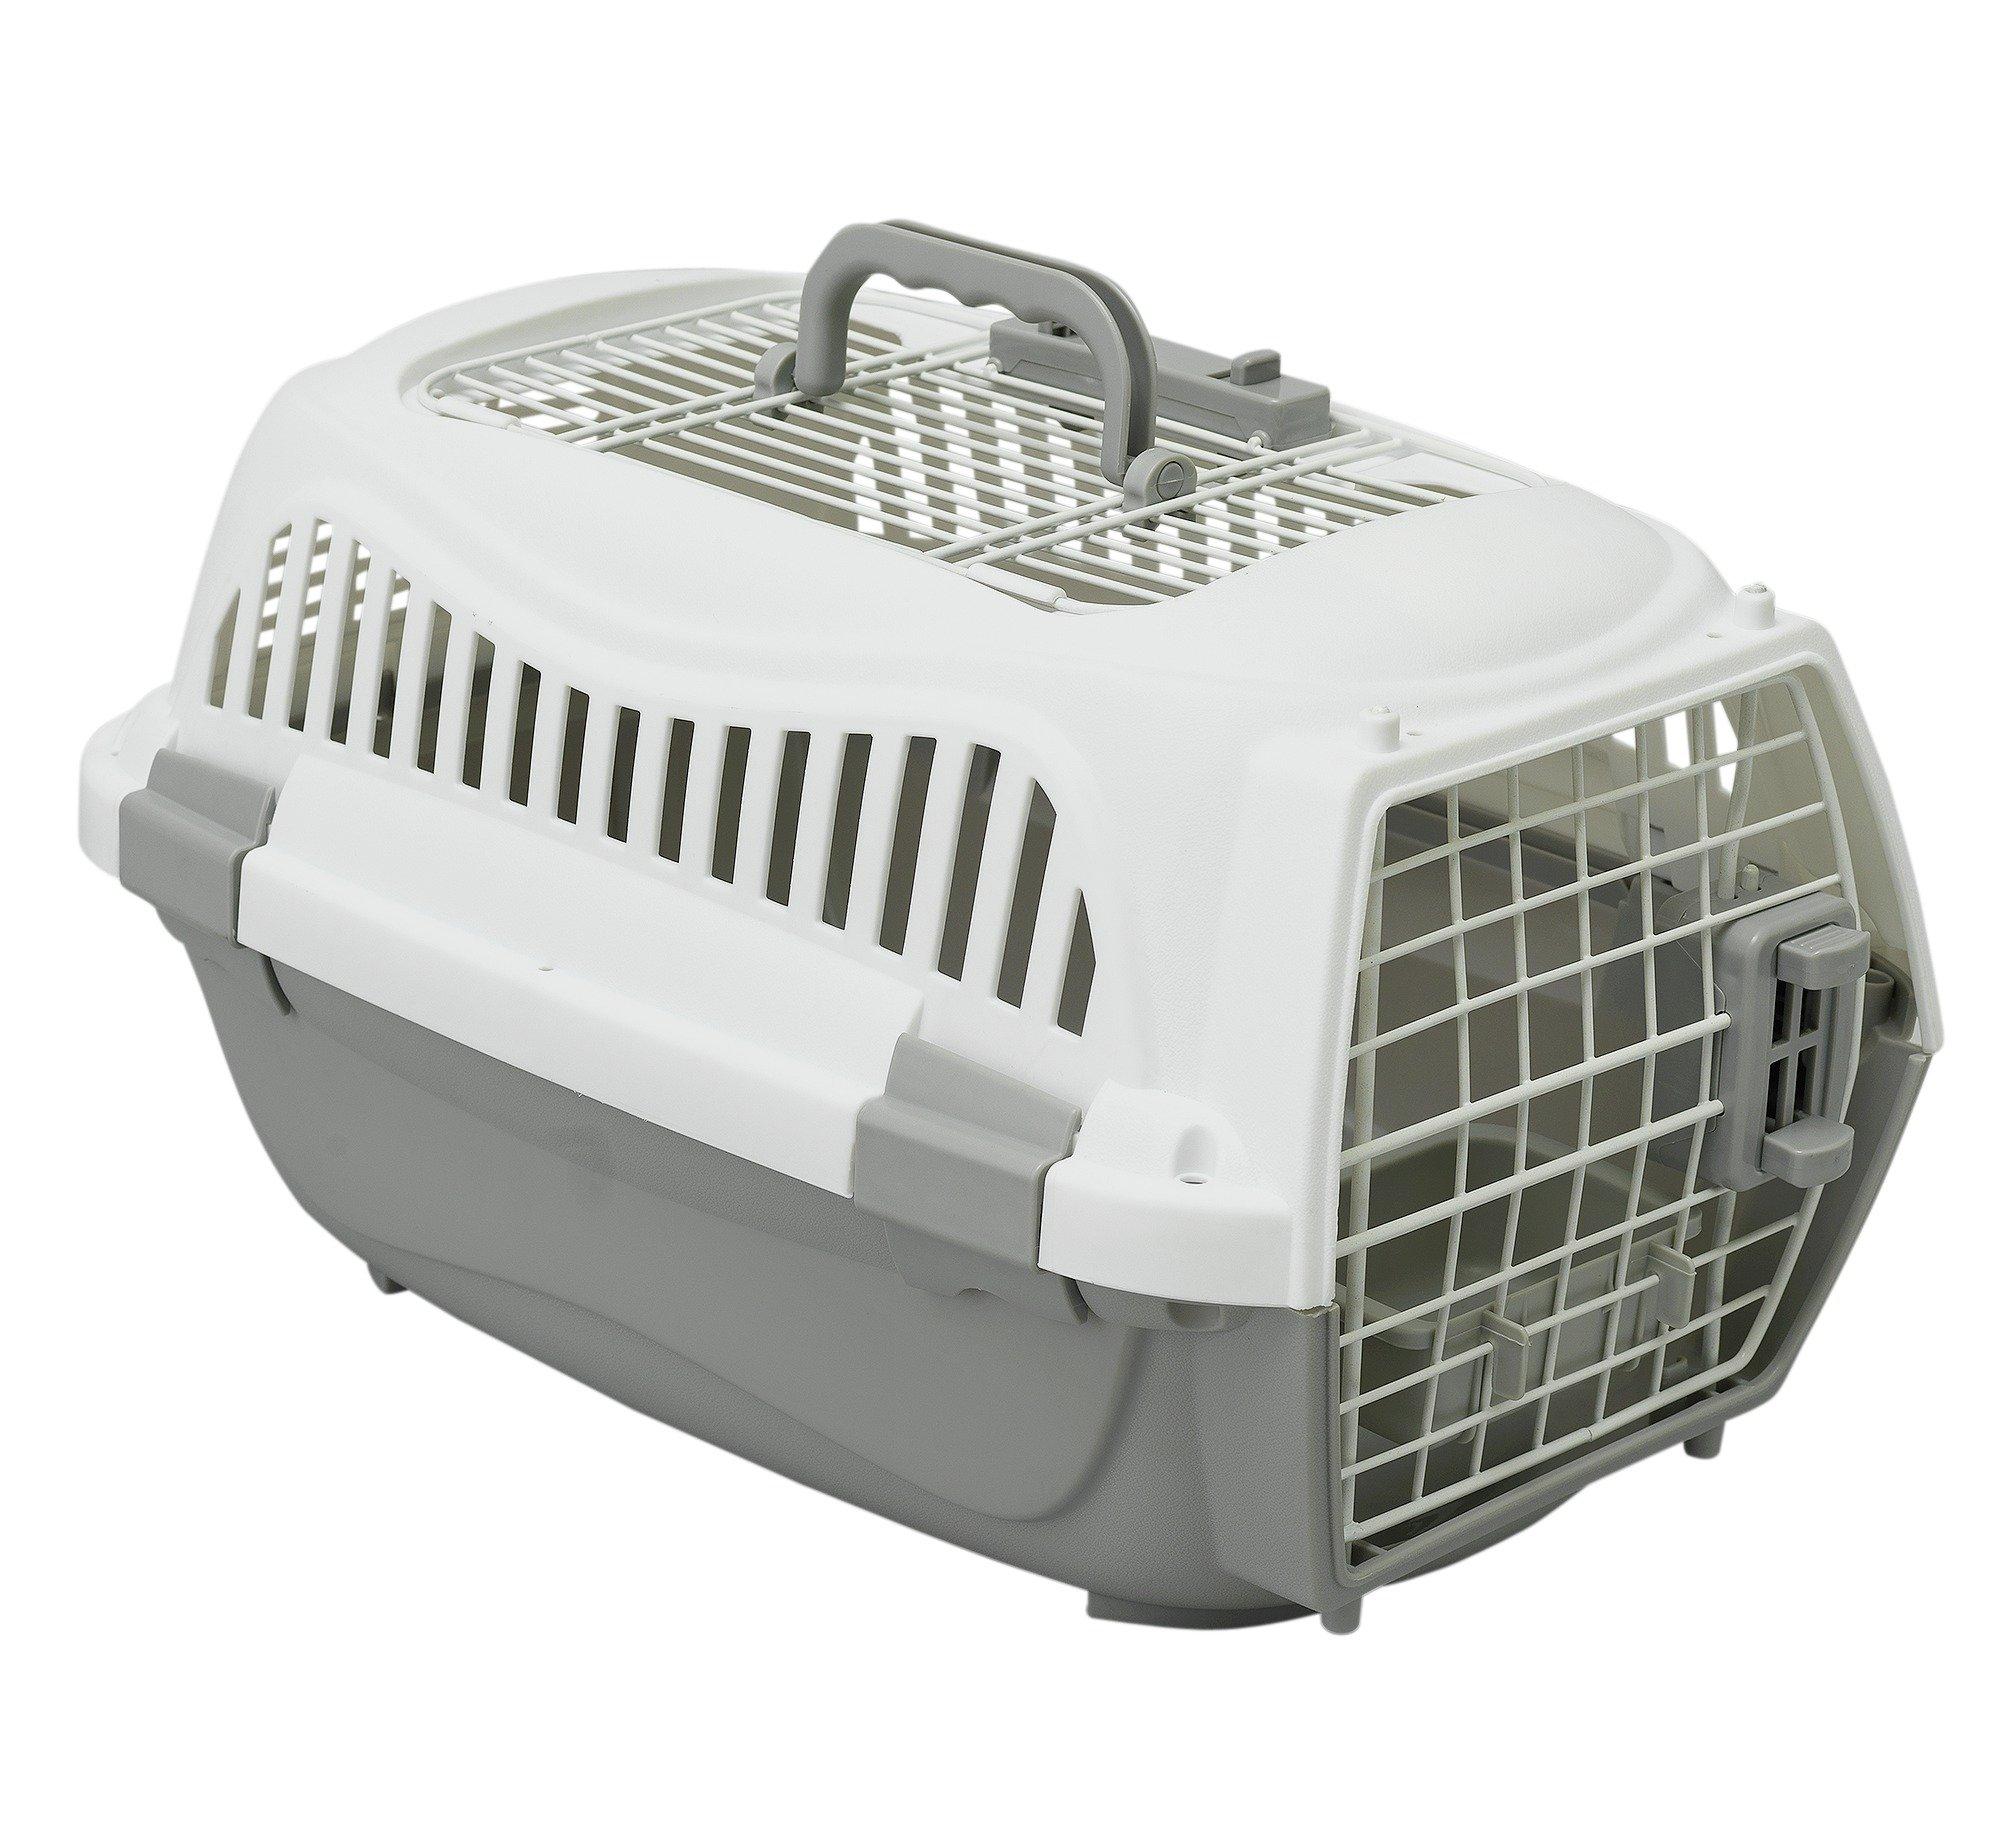 Top Loading Medium Pet Carrier